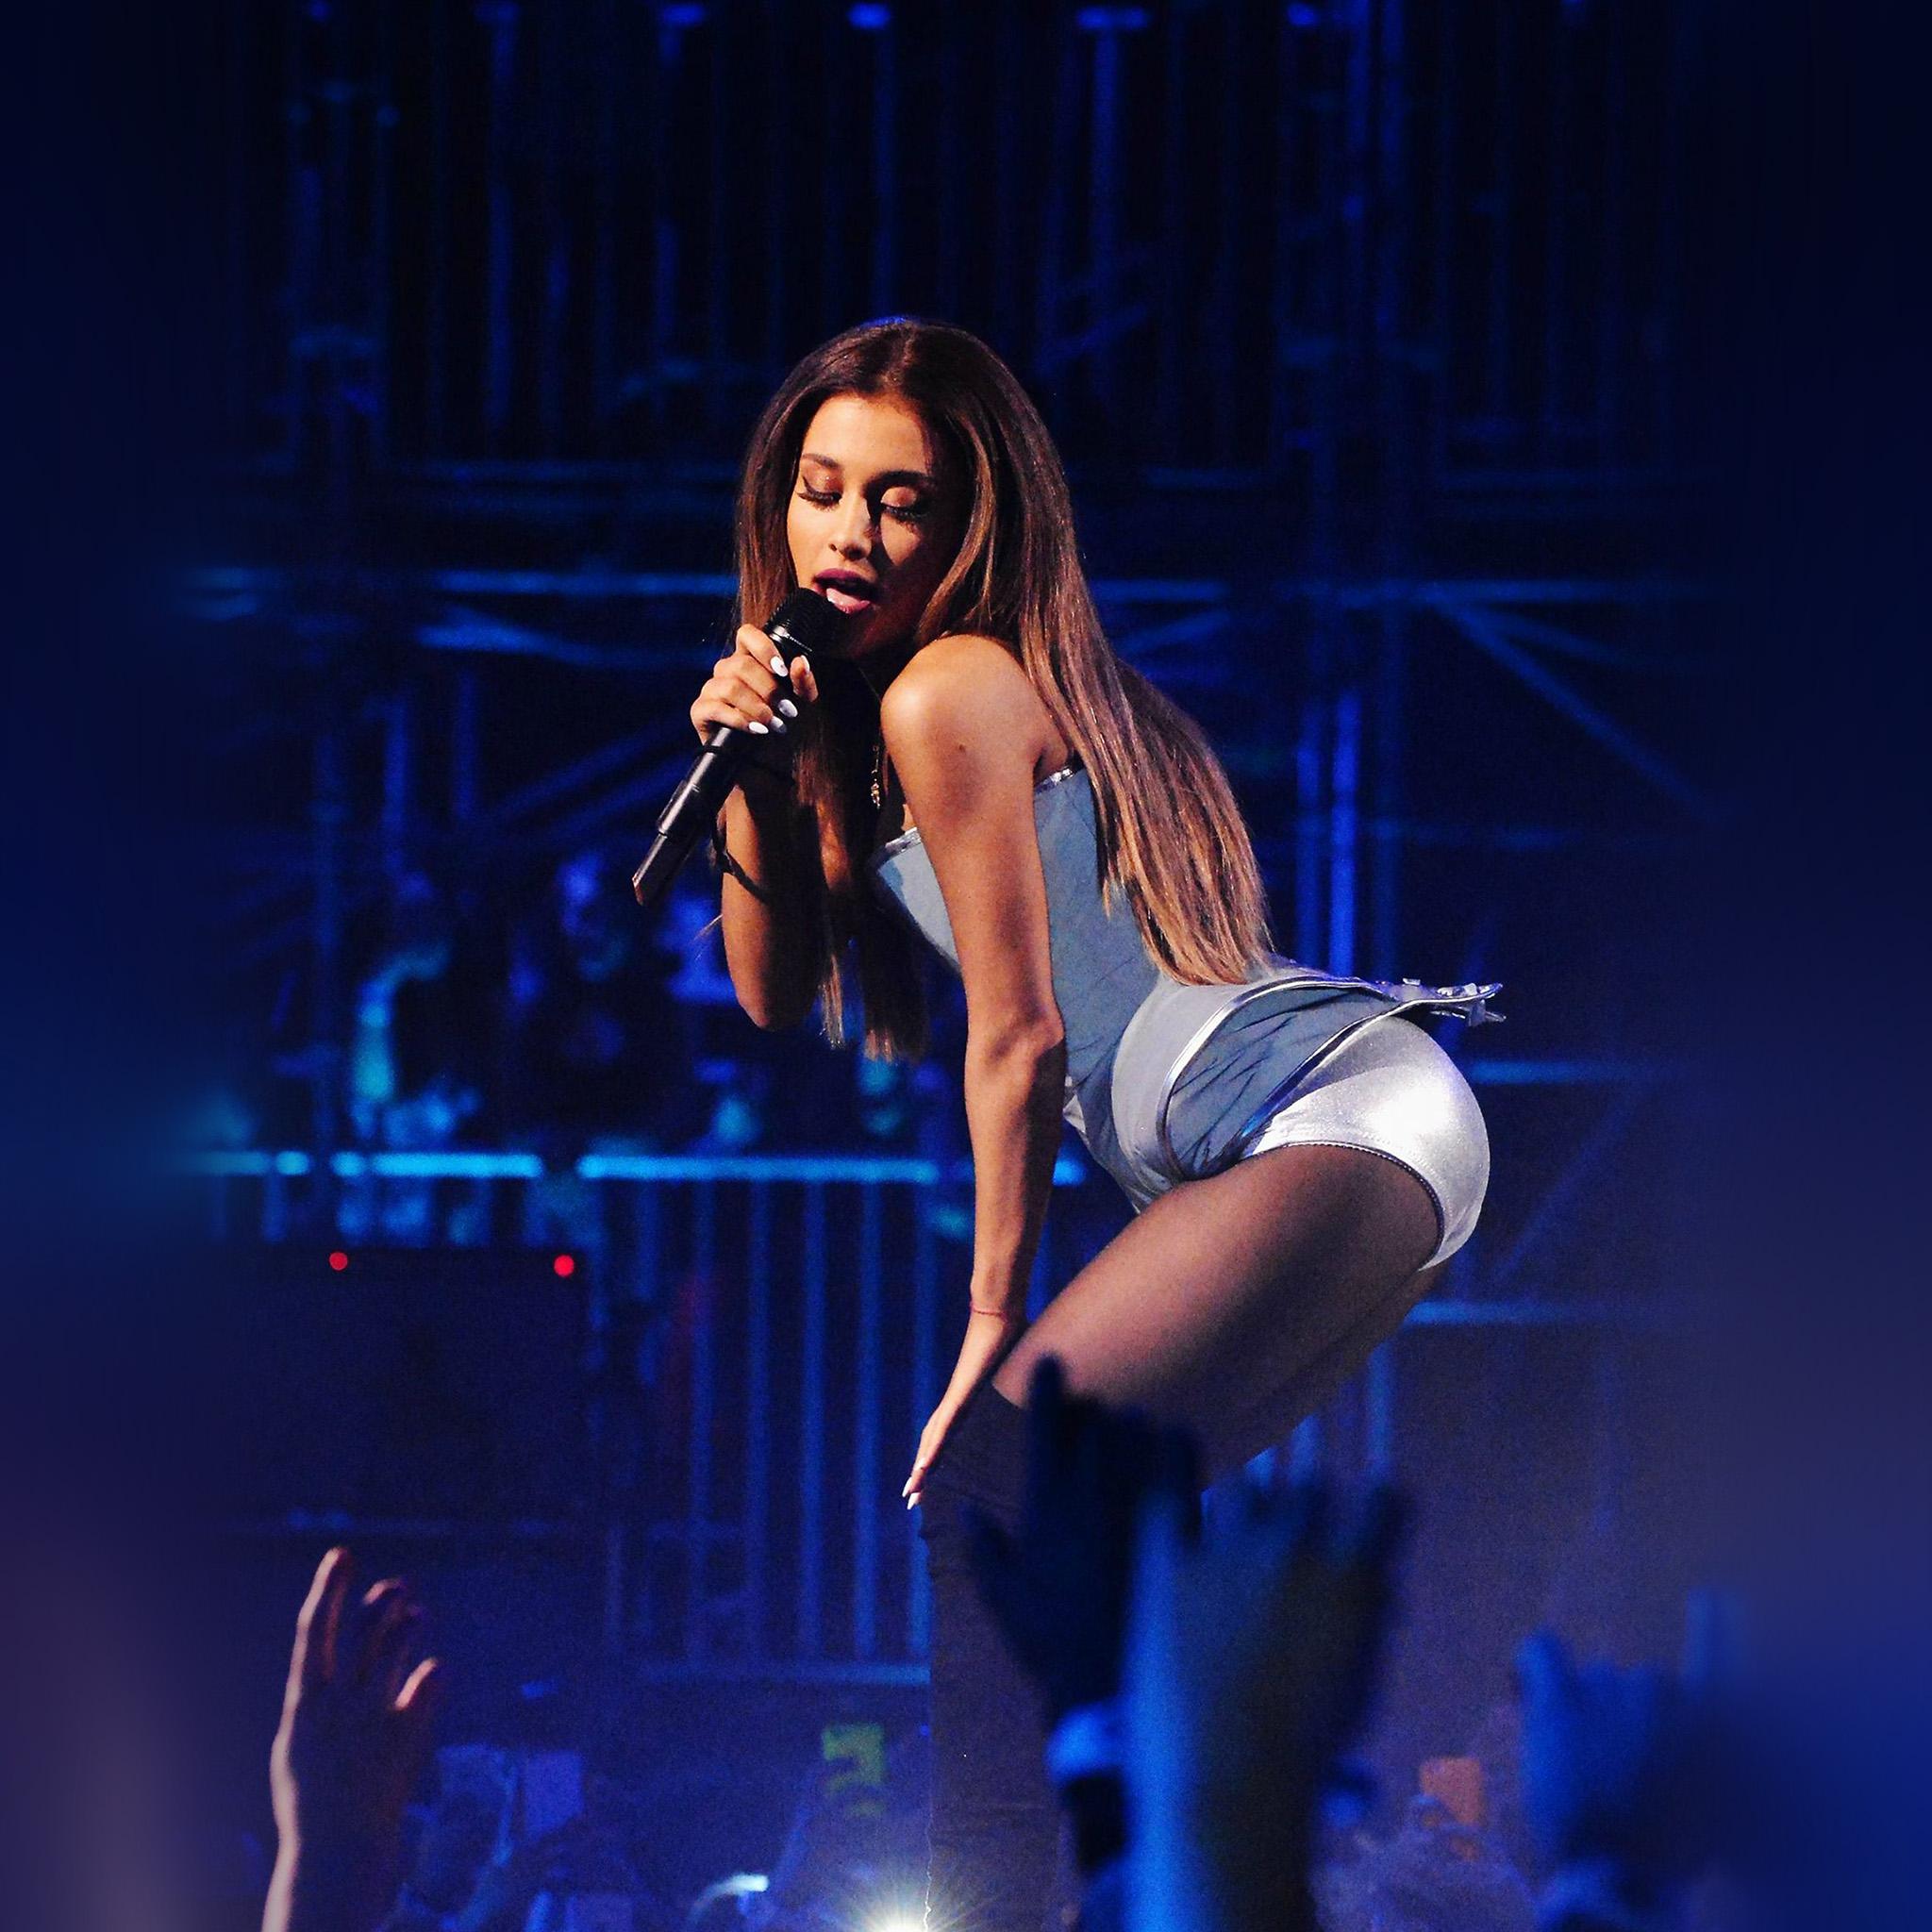 Ariana Grande Christmas Wallpaper: Hi34-ariana-grande-music